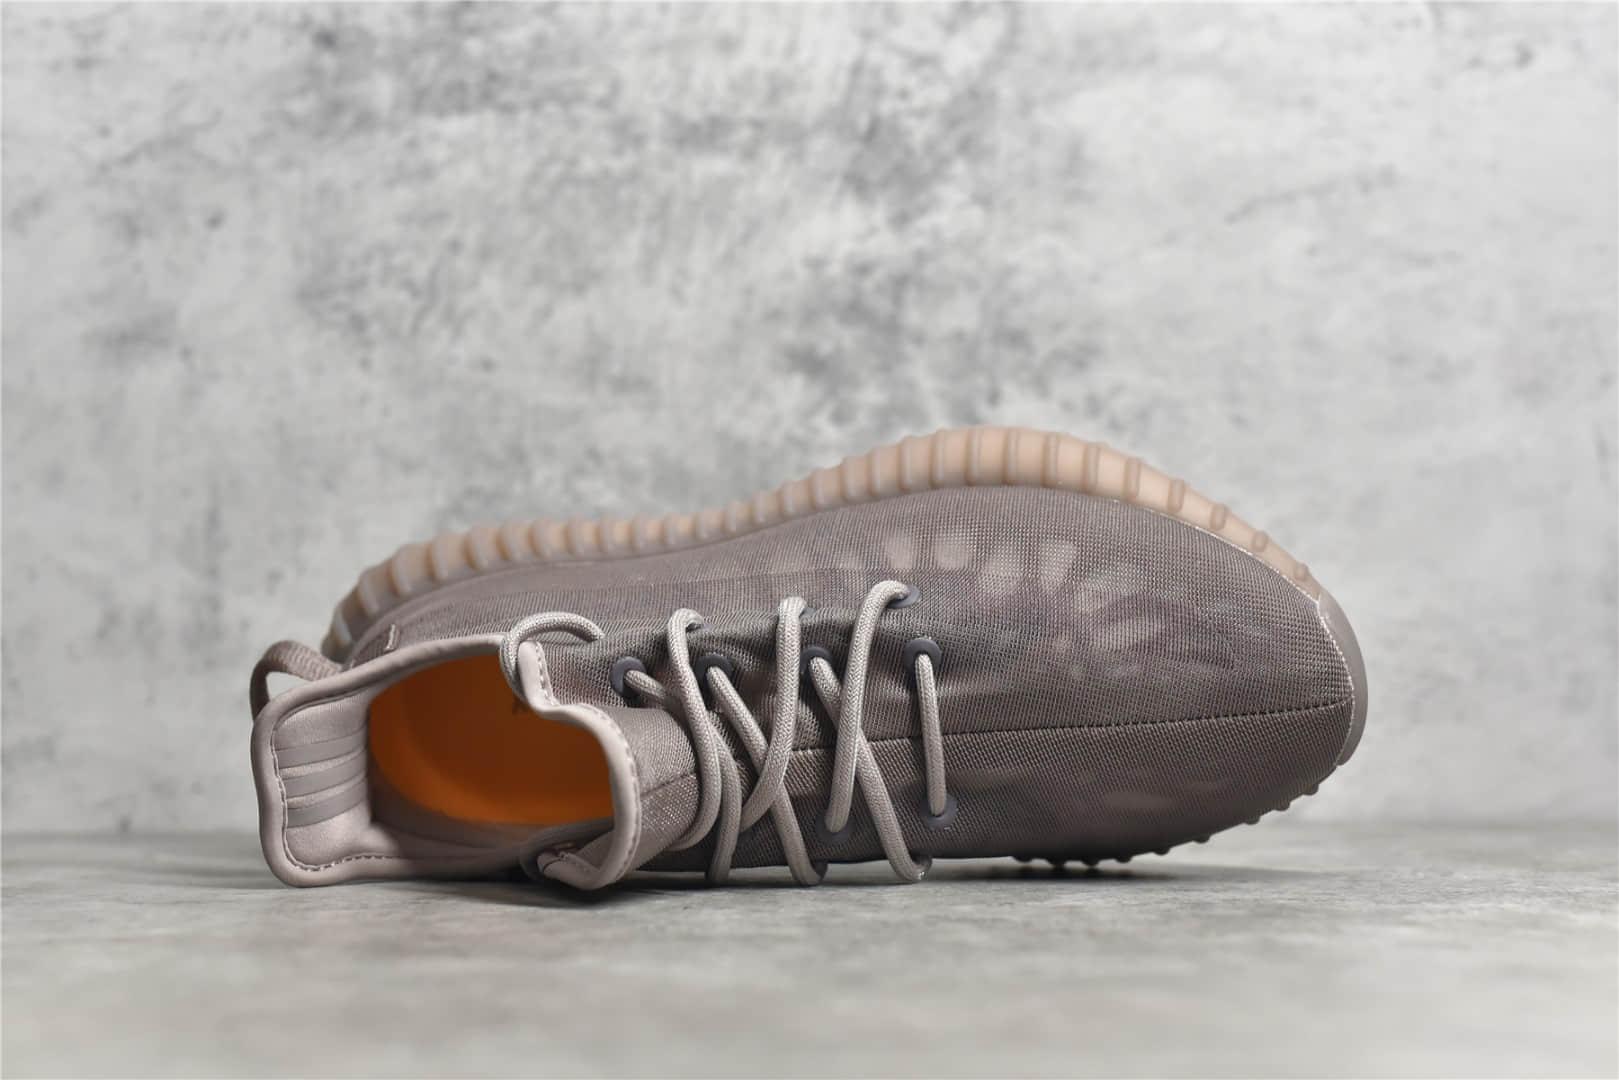 OG纯原版本椰子350V2迷雾棕新款椰子棕色 adidas originals YeezyBoost 350 V2